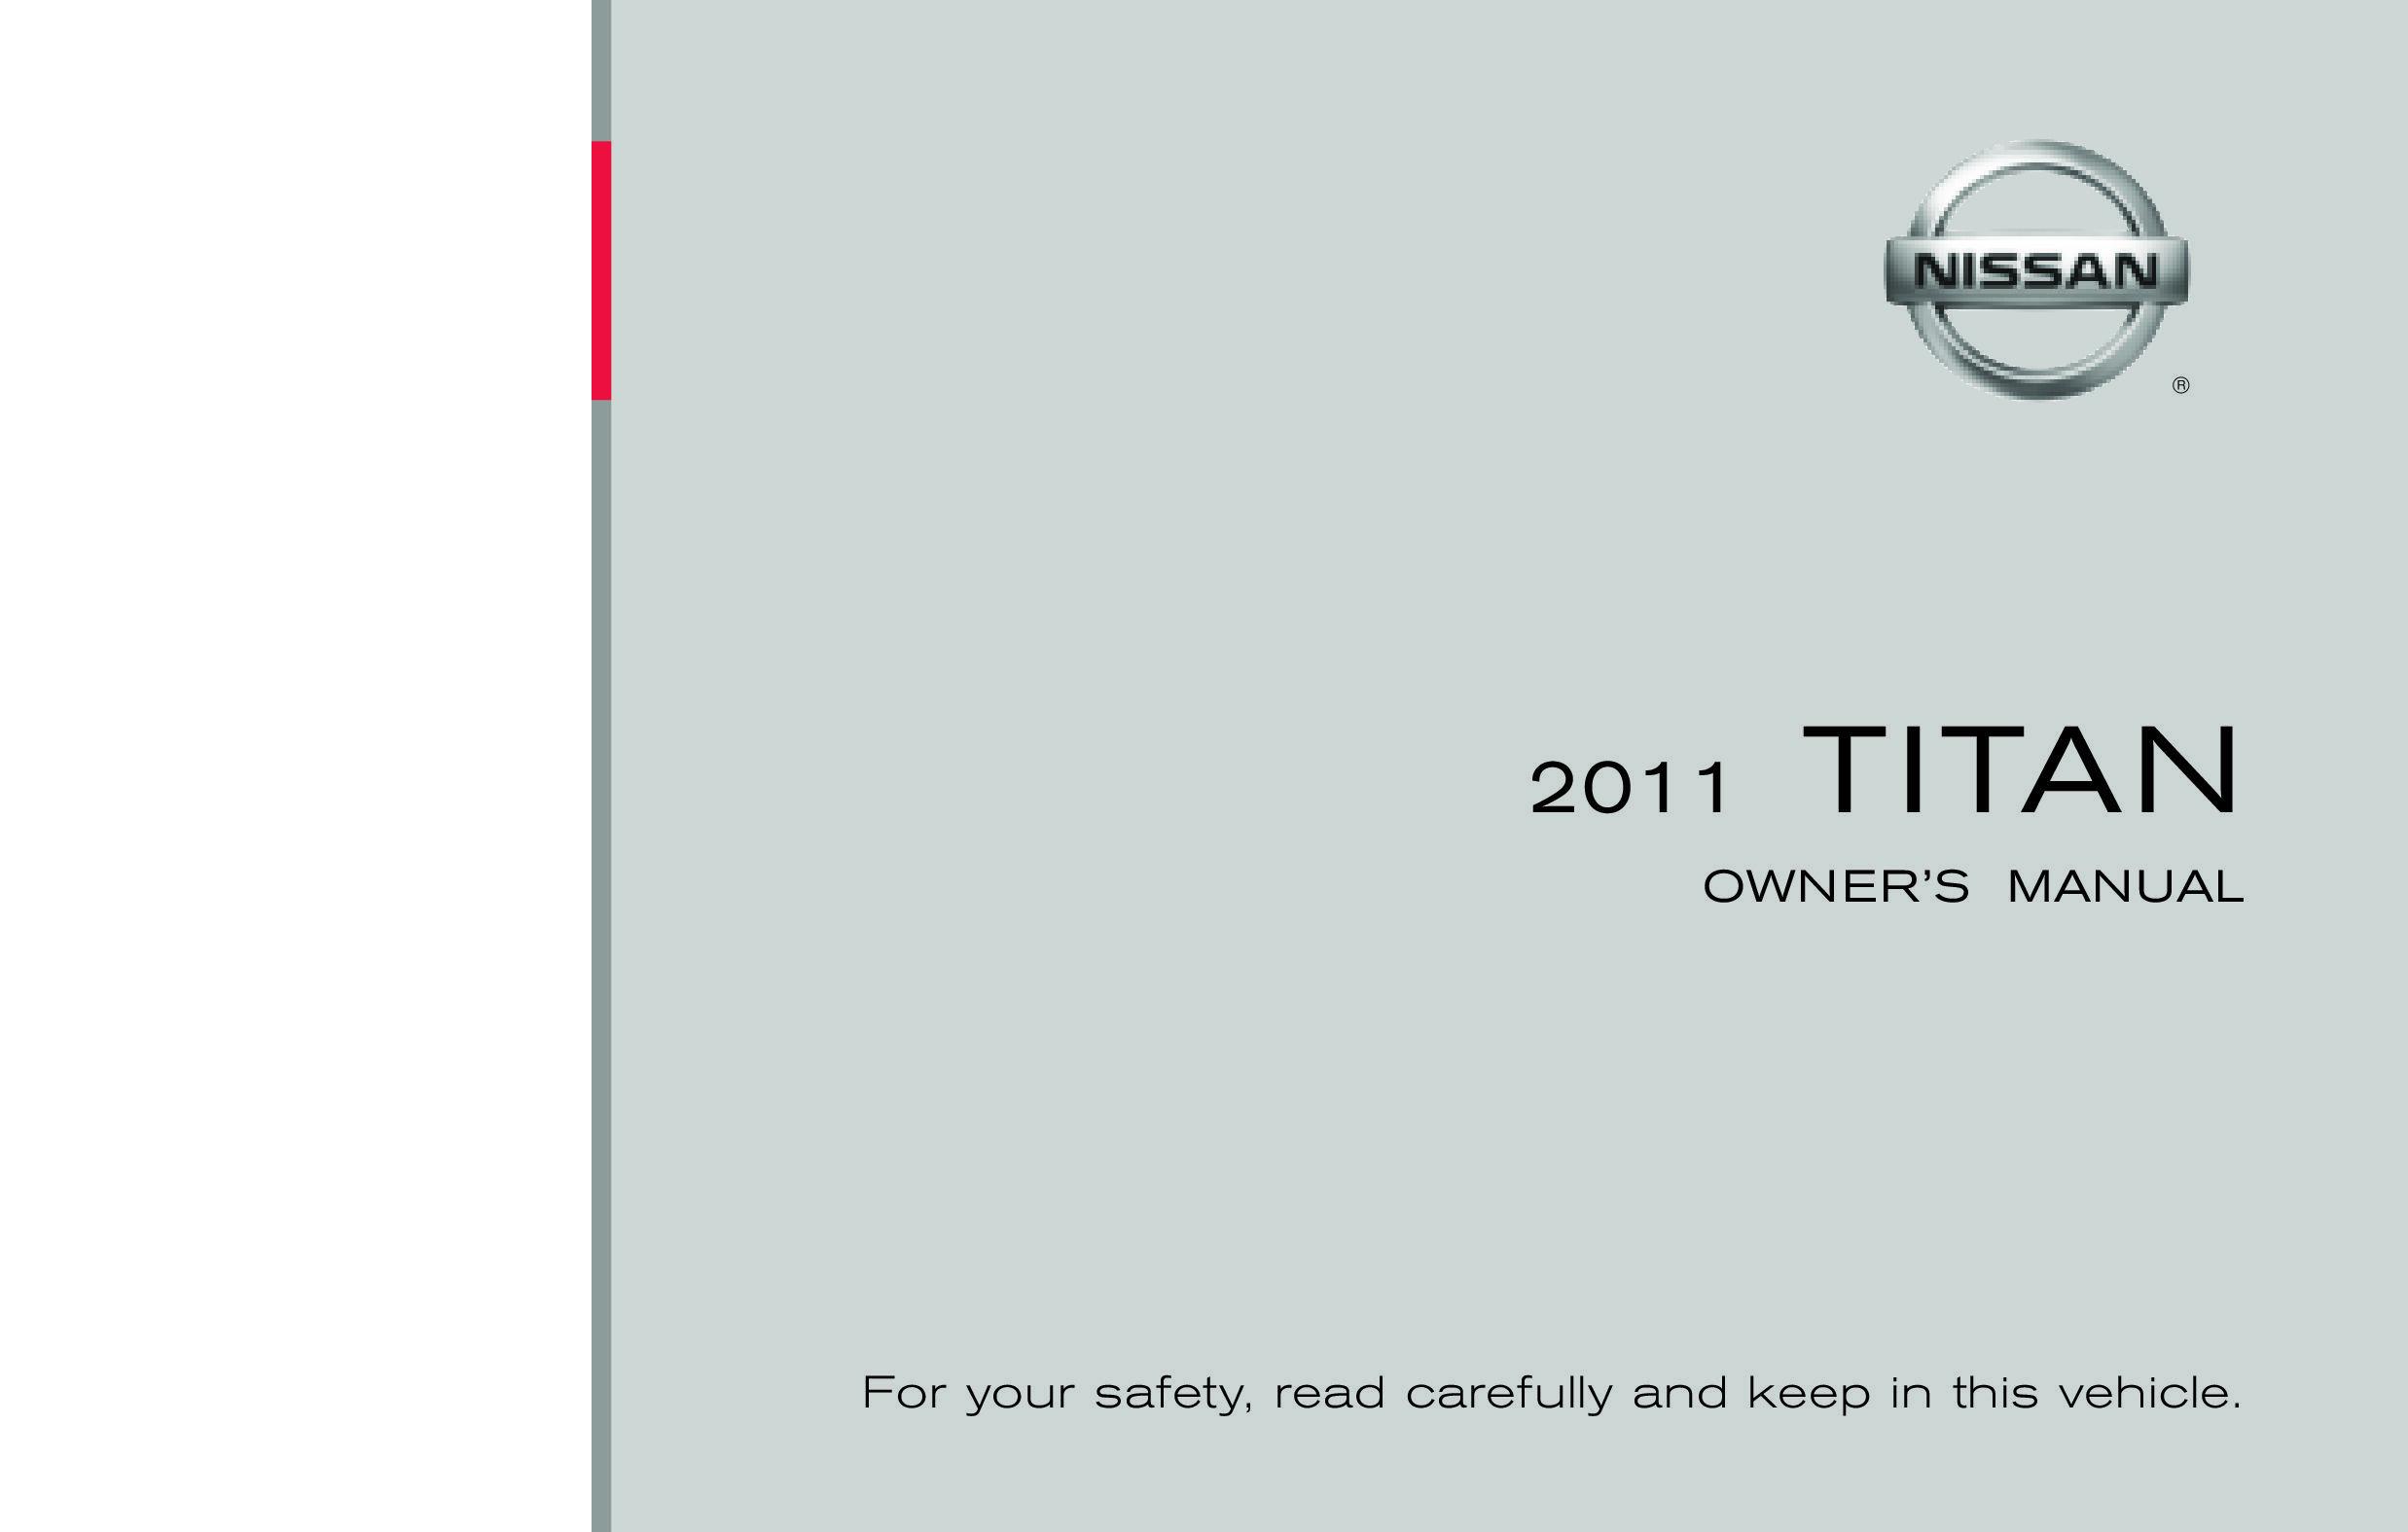 2011 Nissan Titan owners manual